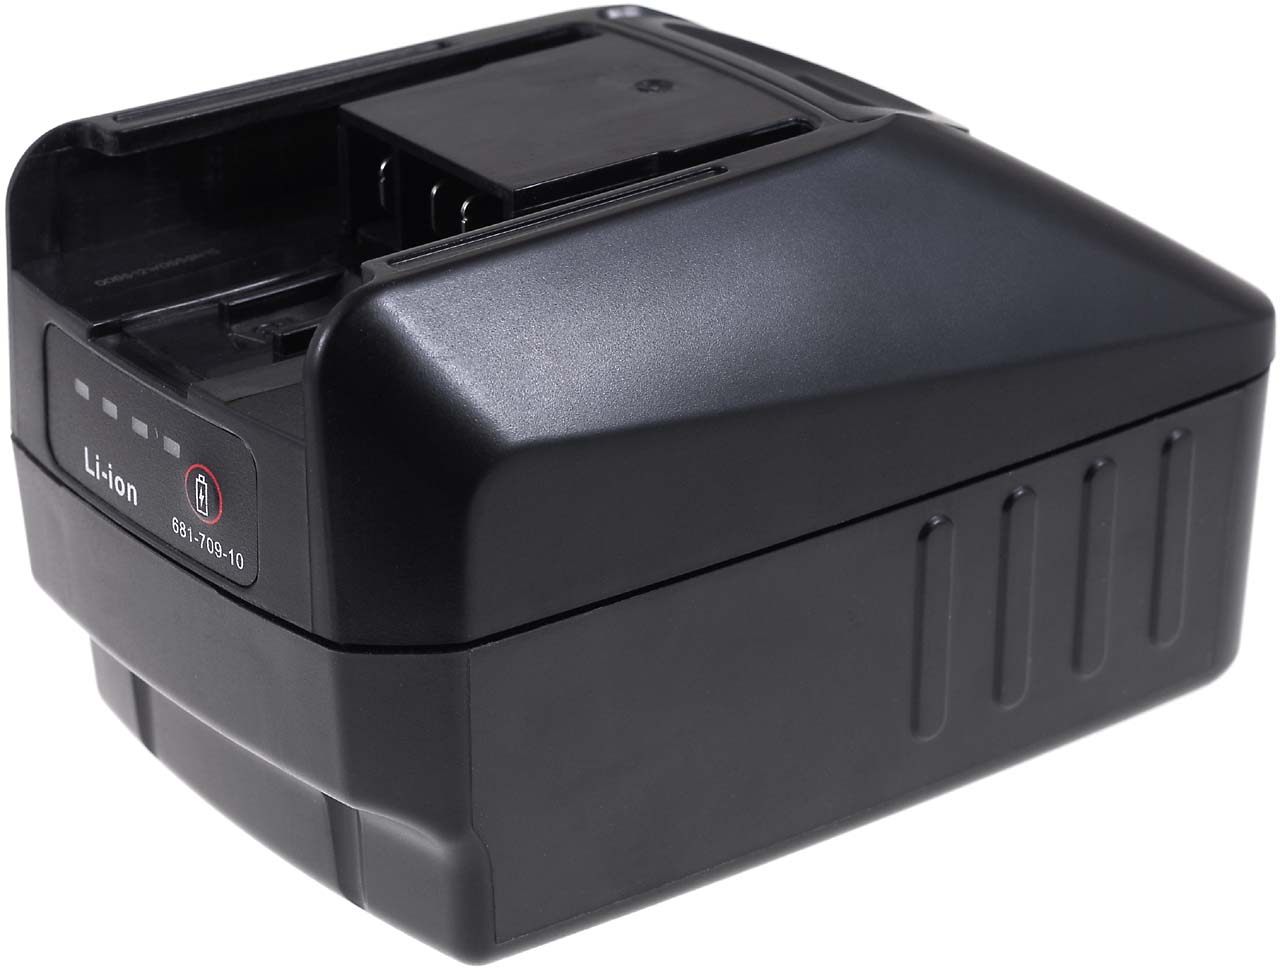 Acumulator compatibil Fein ASCD 18 W4C